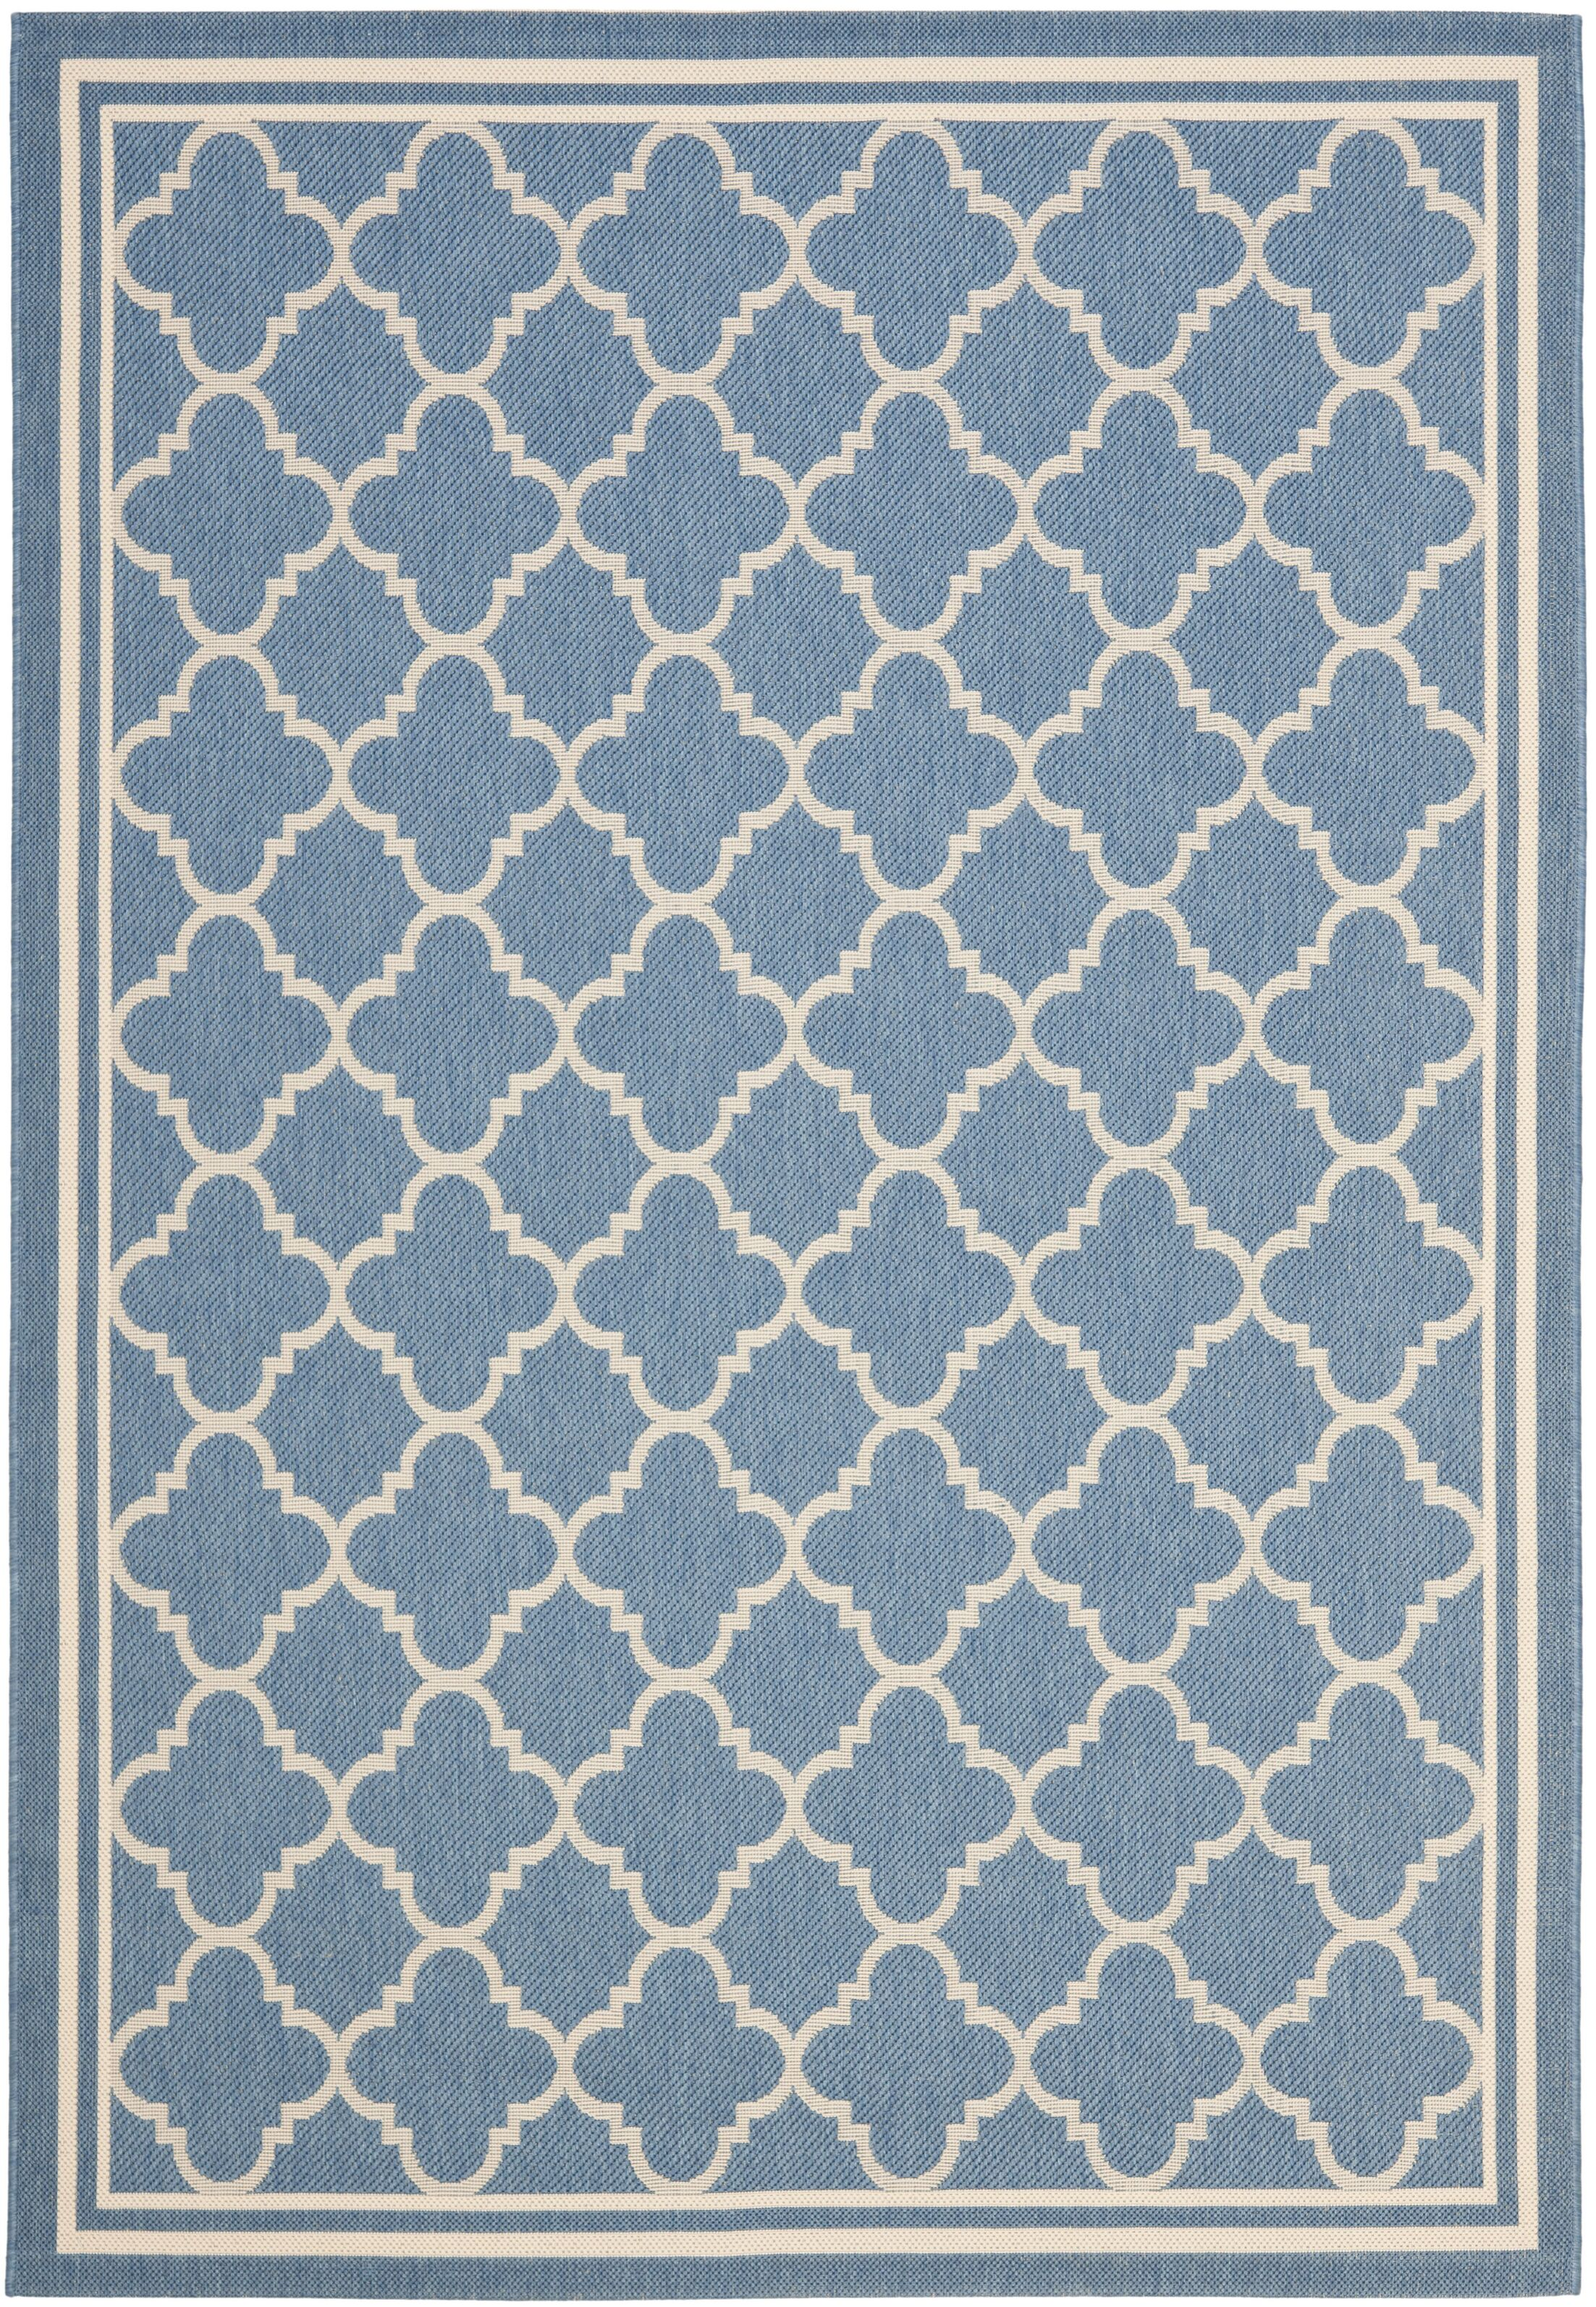 Bexton Blue Indoor/Outdoor Area Rug Rug Size: Rectangle 8' x 11'2